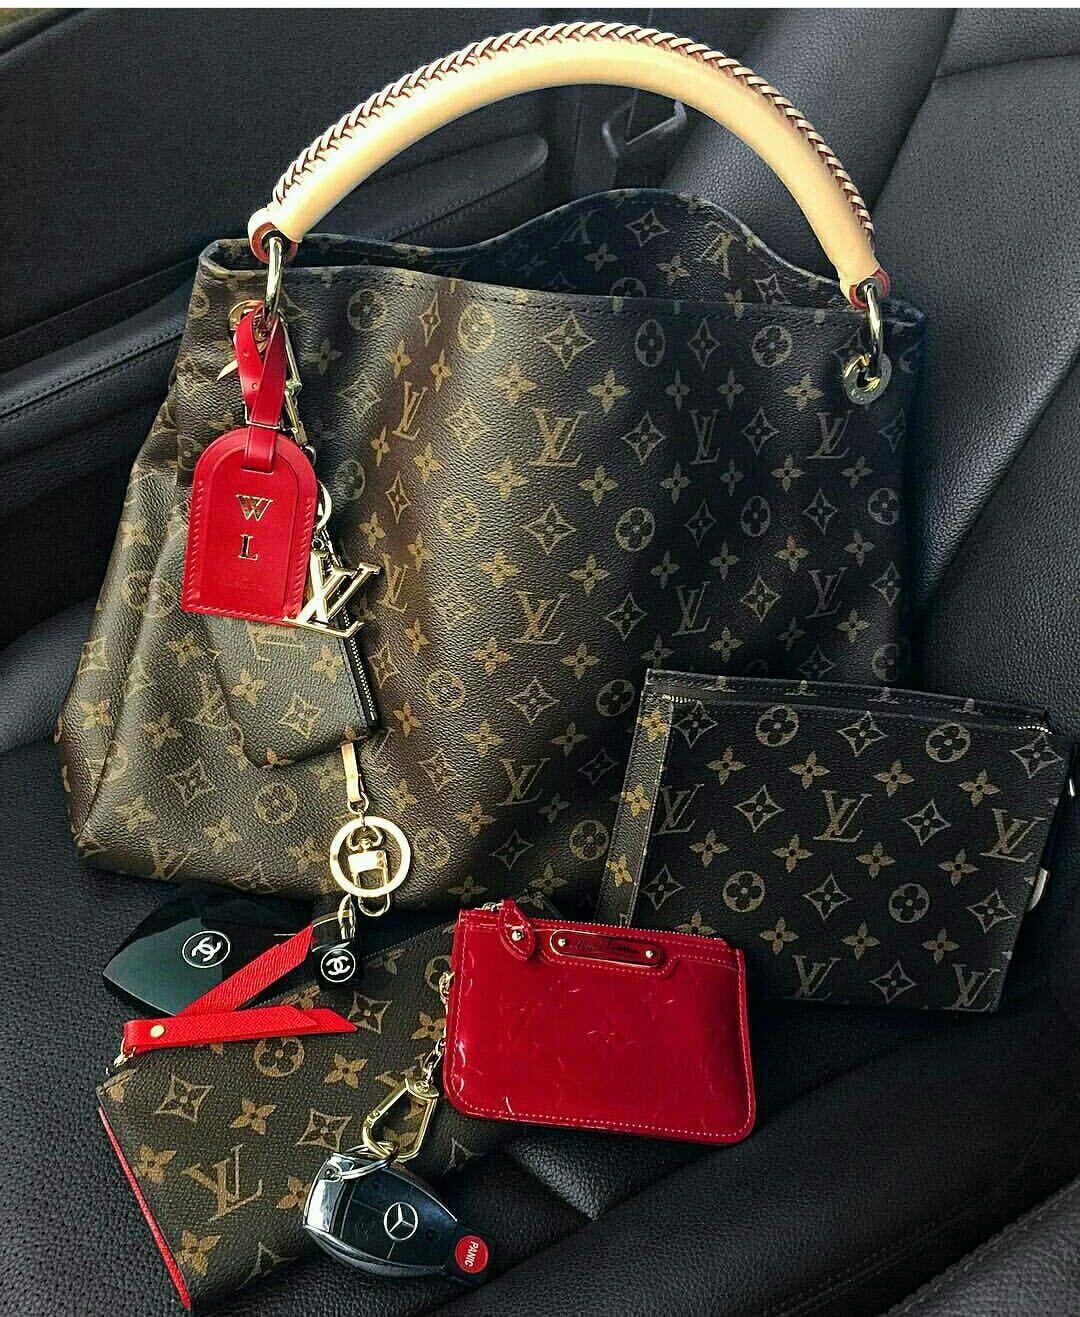 ✨- Pinterest ; VeeBvlla✨ More - Handbags & Wallets - http://amzn.to/2hEuzfO